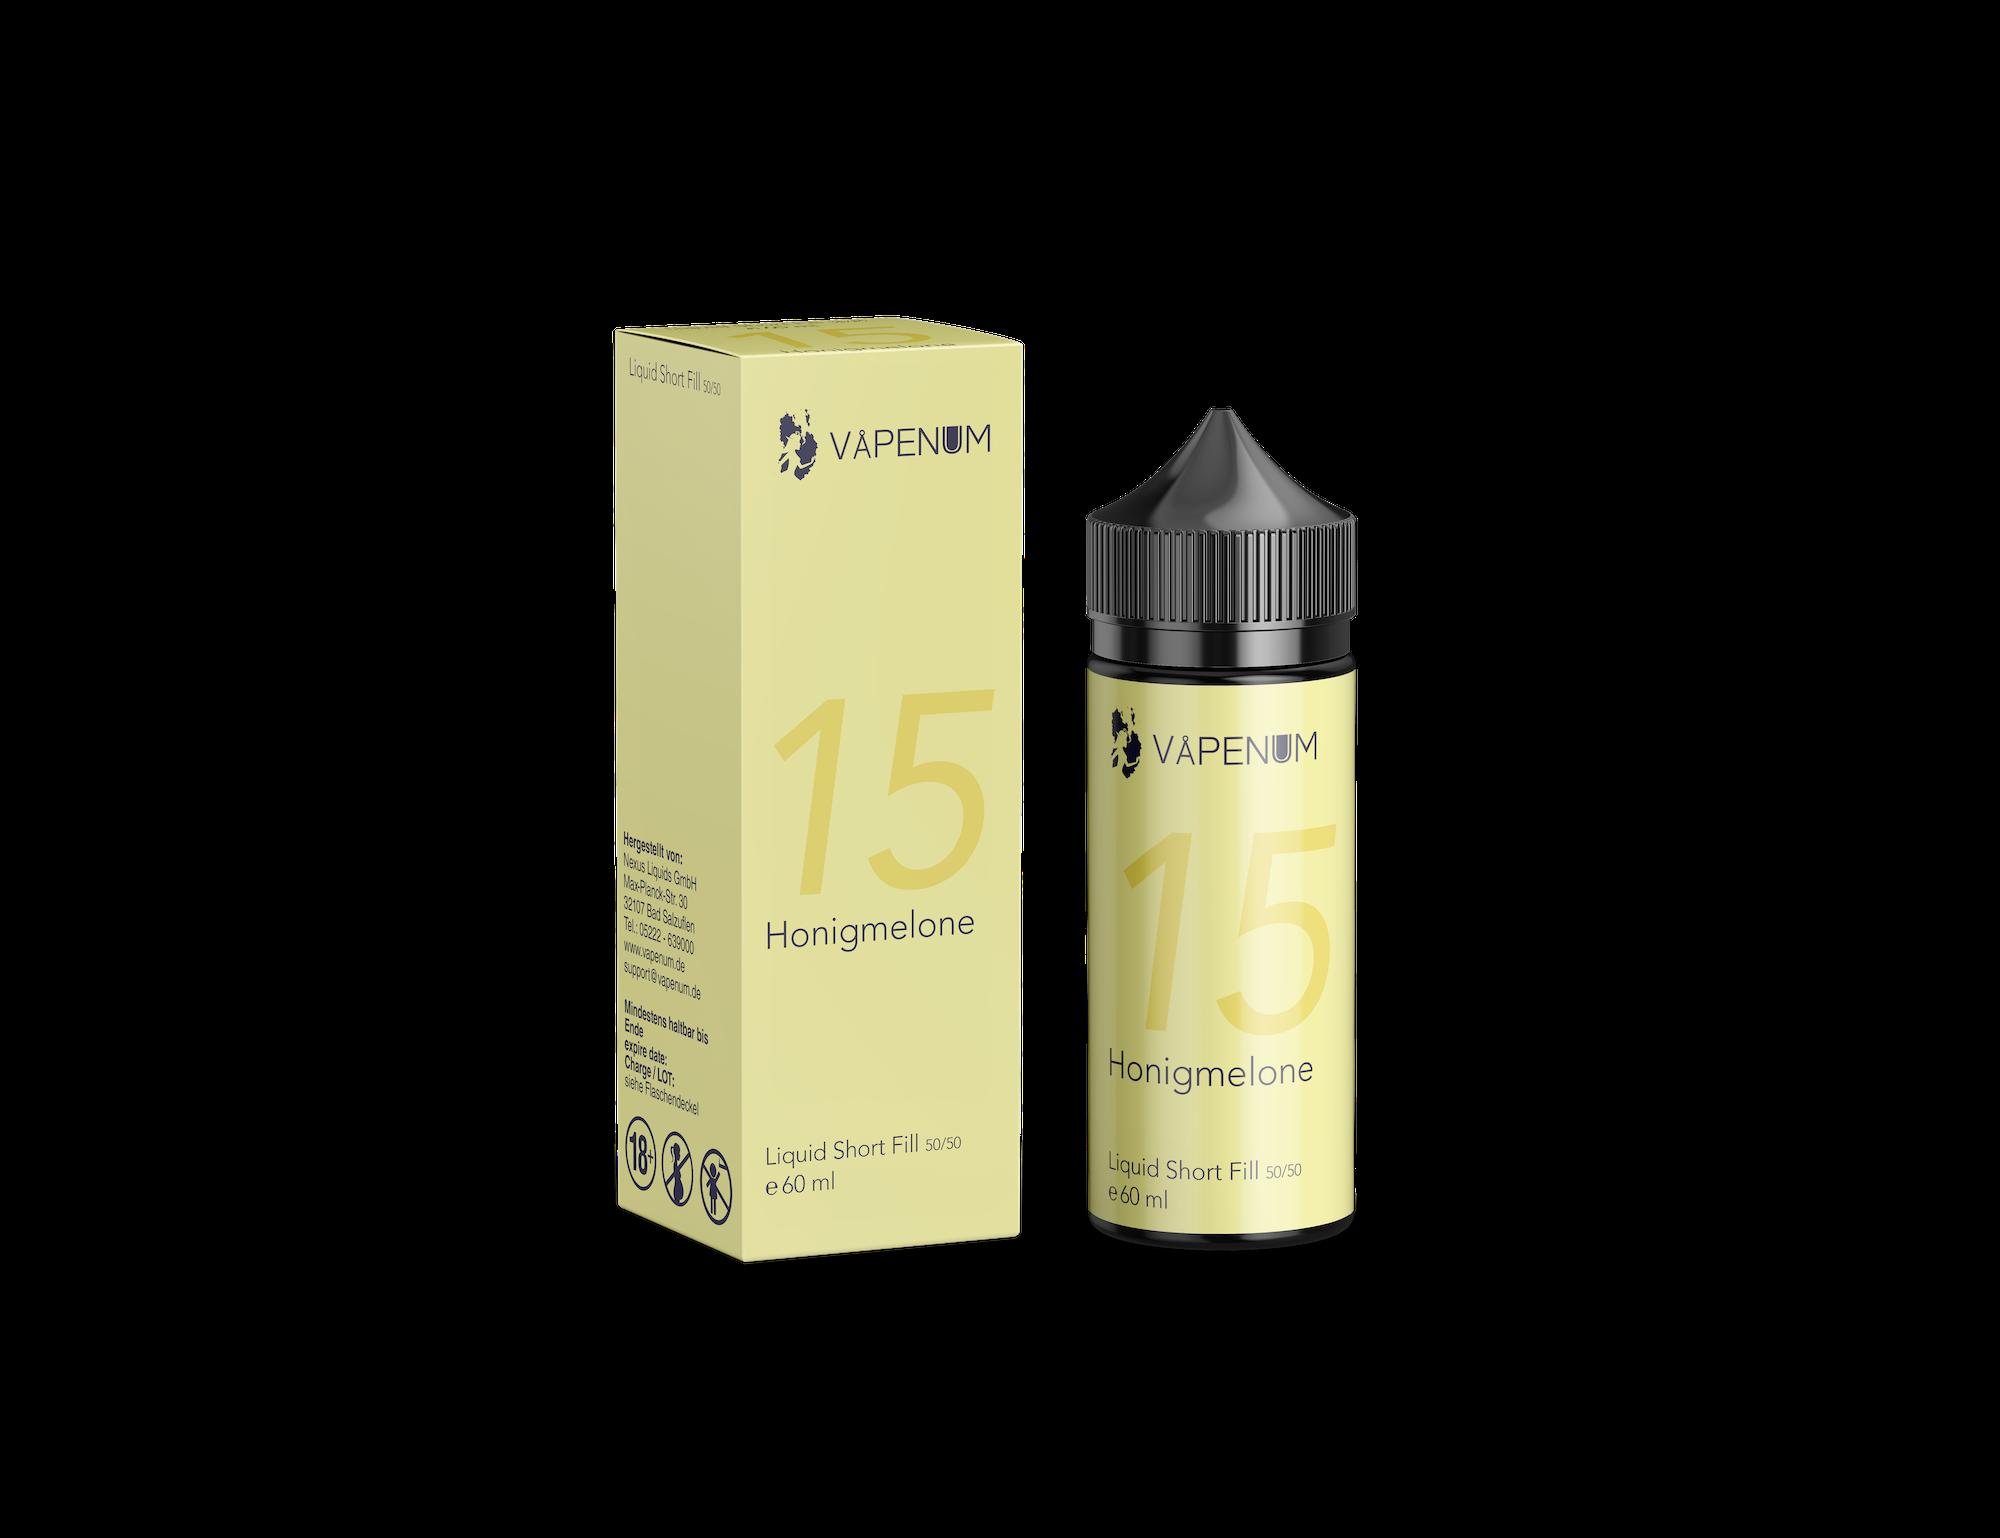 Vapenum Shortfill 15 - Honigmelone